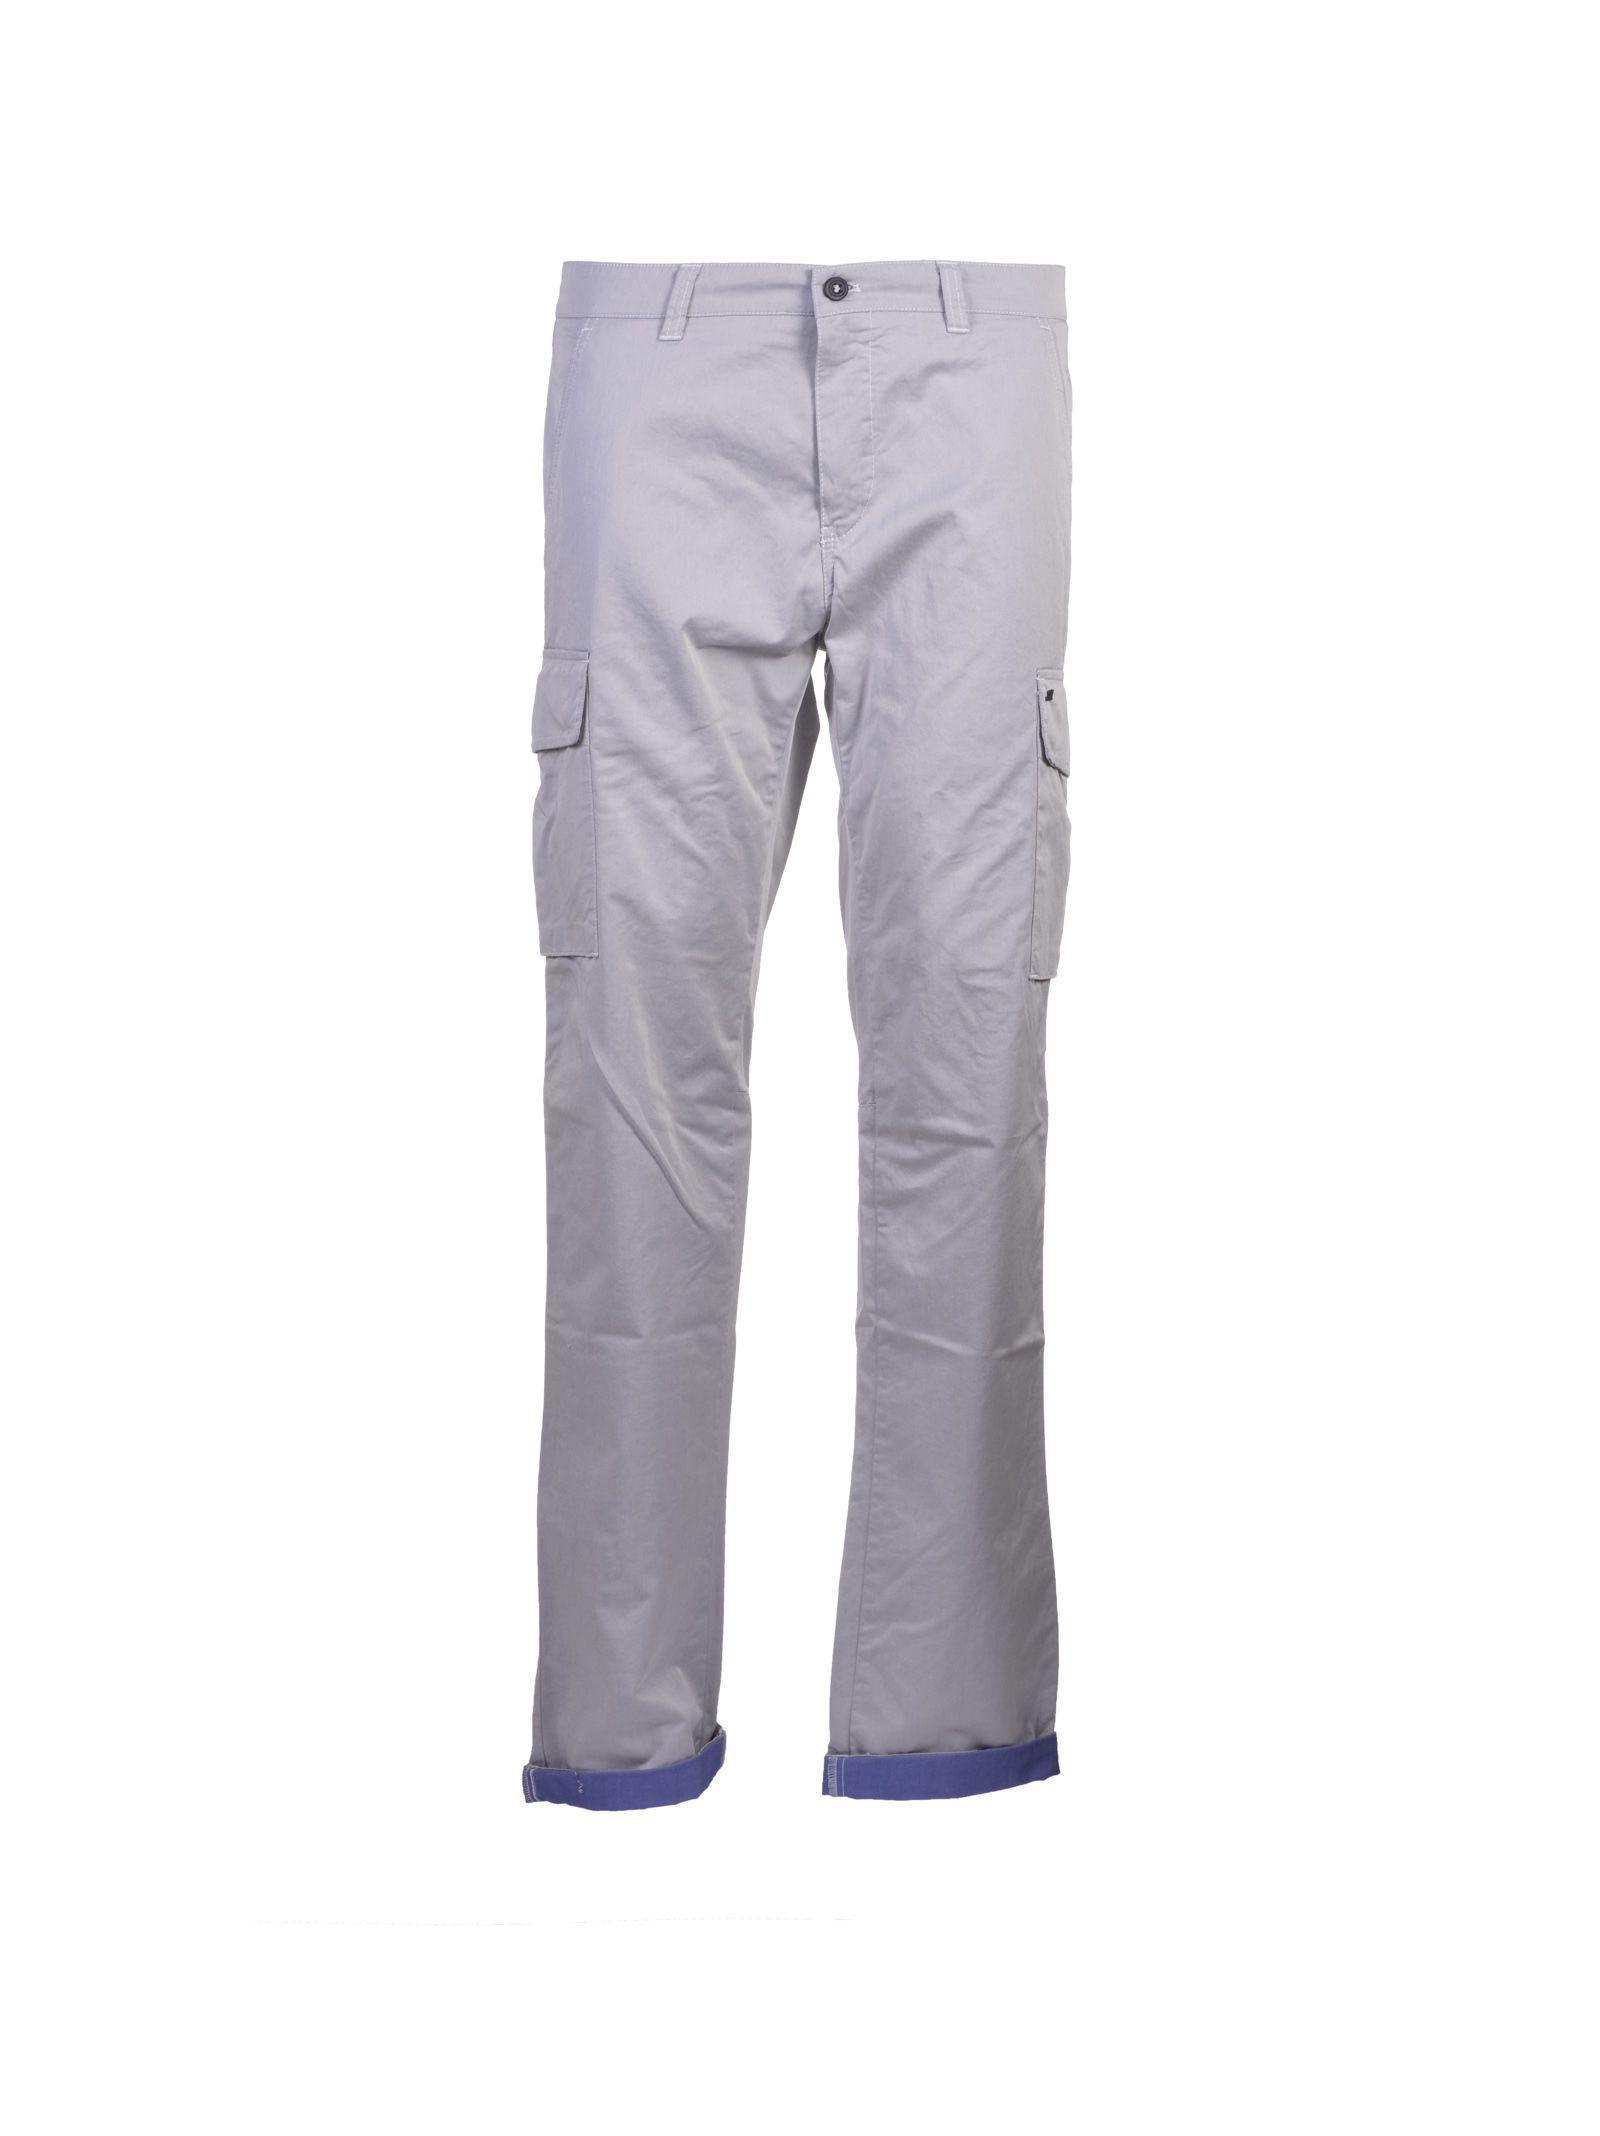 Masons Chile Cargo Trousers